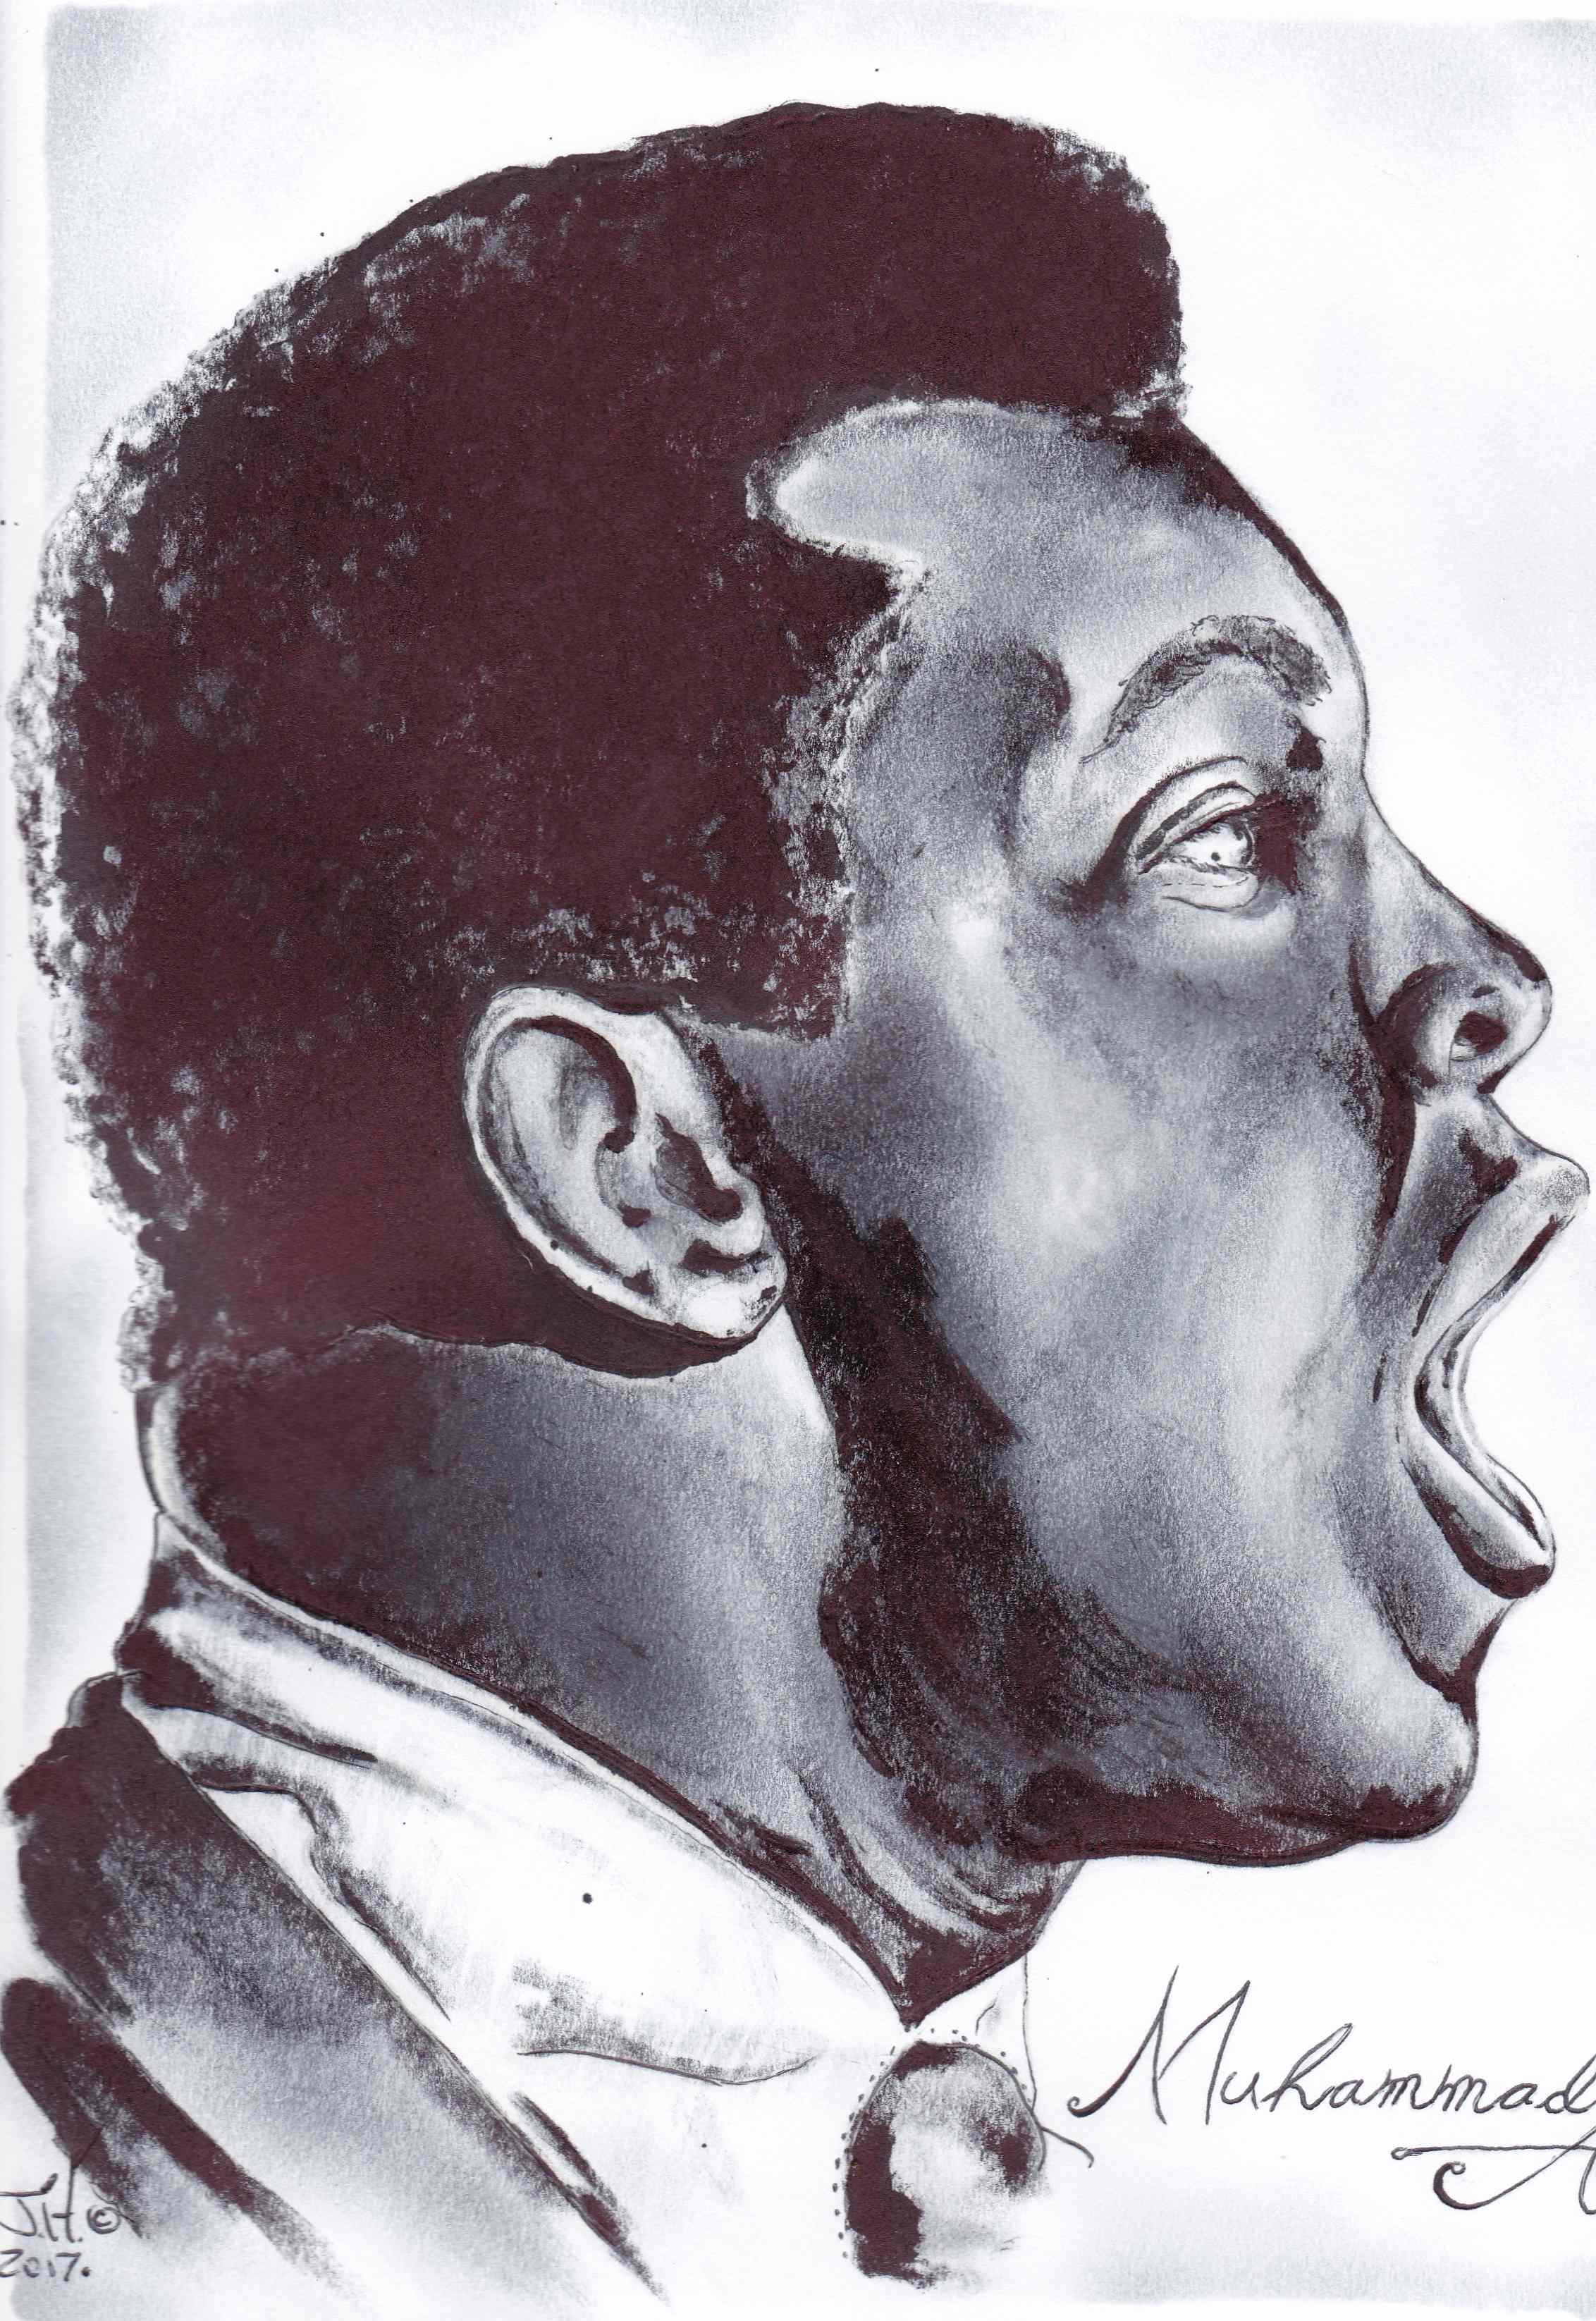 Muhammed Ali by Jeremy J. Hammill pen and ink drawing-IMG_20170616_0001 - Copy.jpg